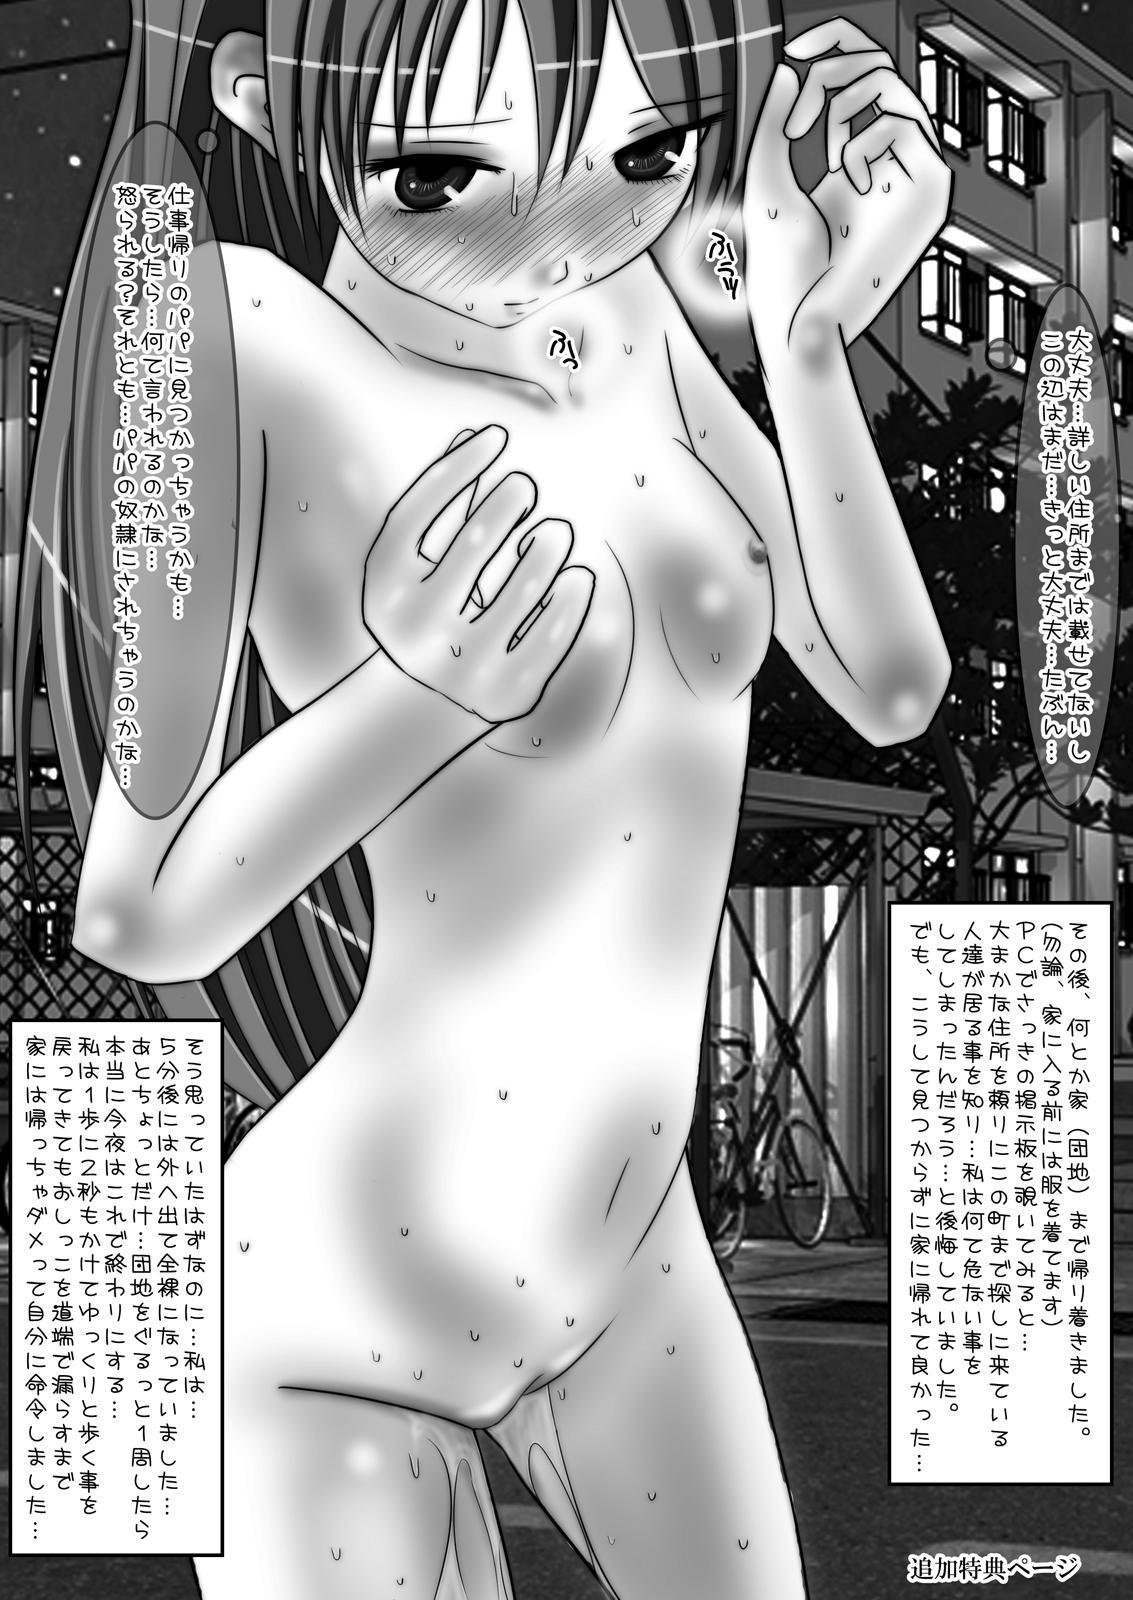 Roshutsu Cosplay Shoujo 1-kan 21